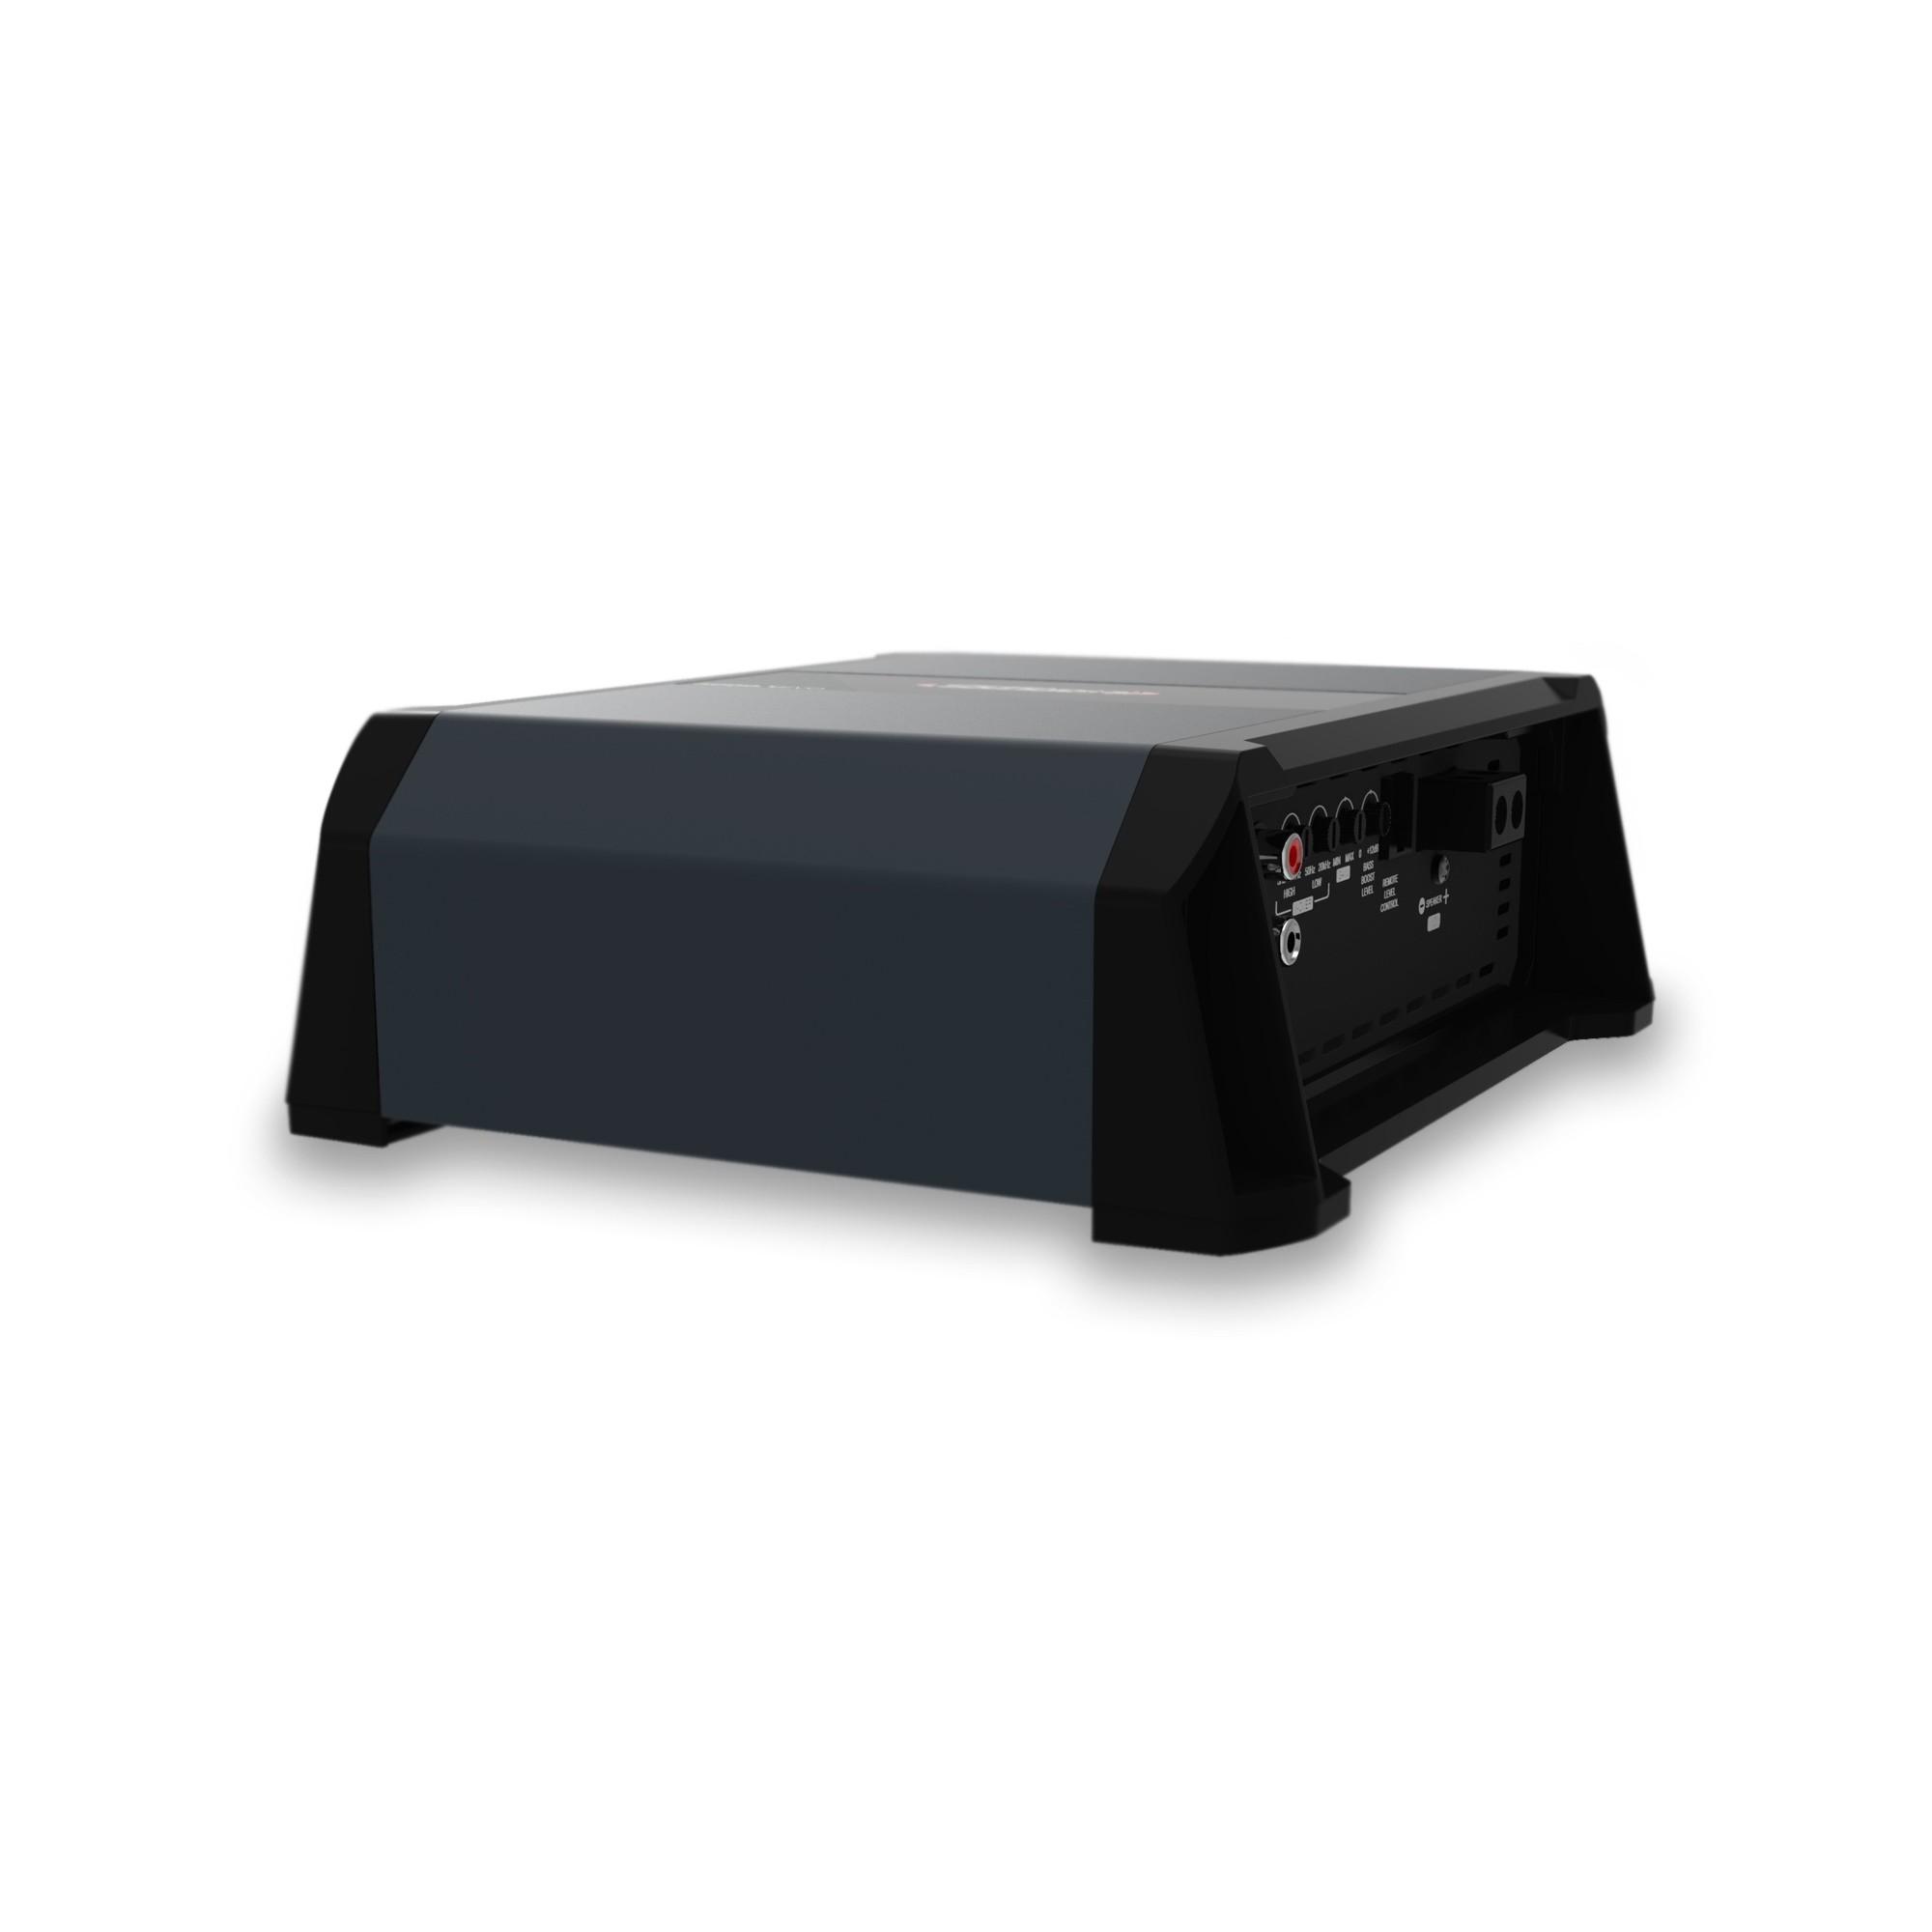 Módulo Amplificador Soundigital SD 3000.1 EVO 4.0 3000W Rms 1 Ohms 1 Canal